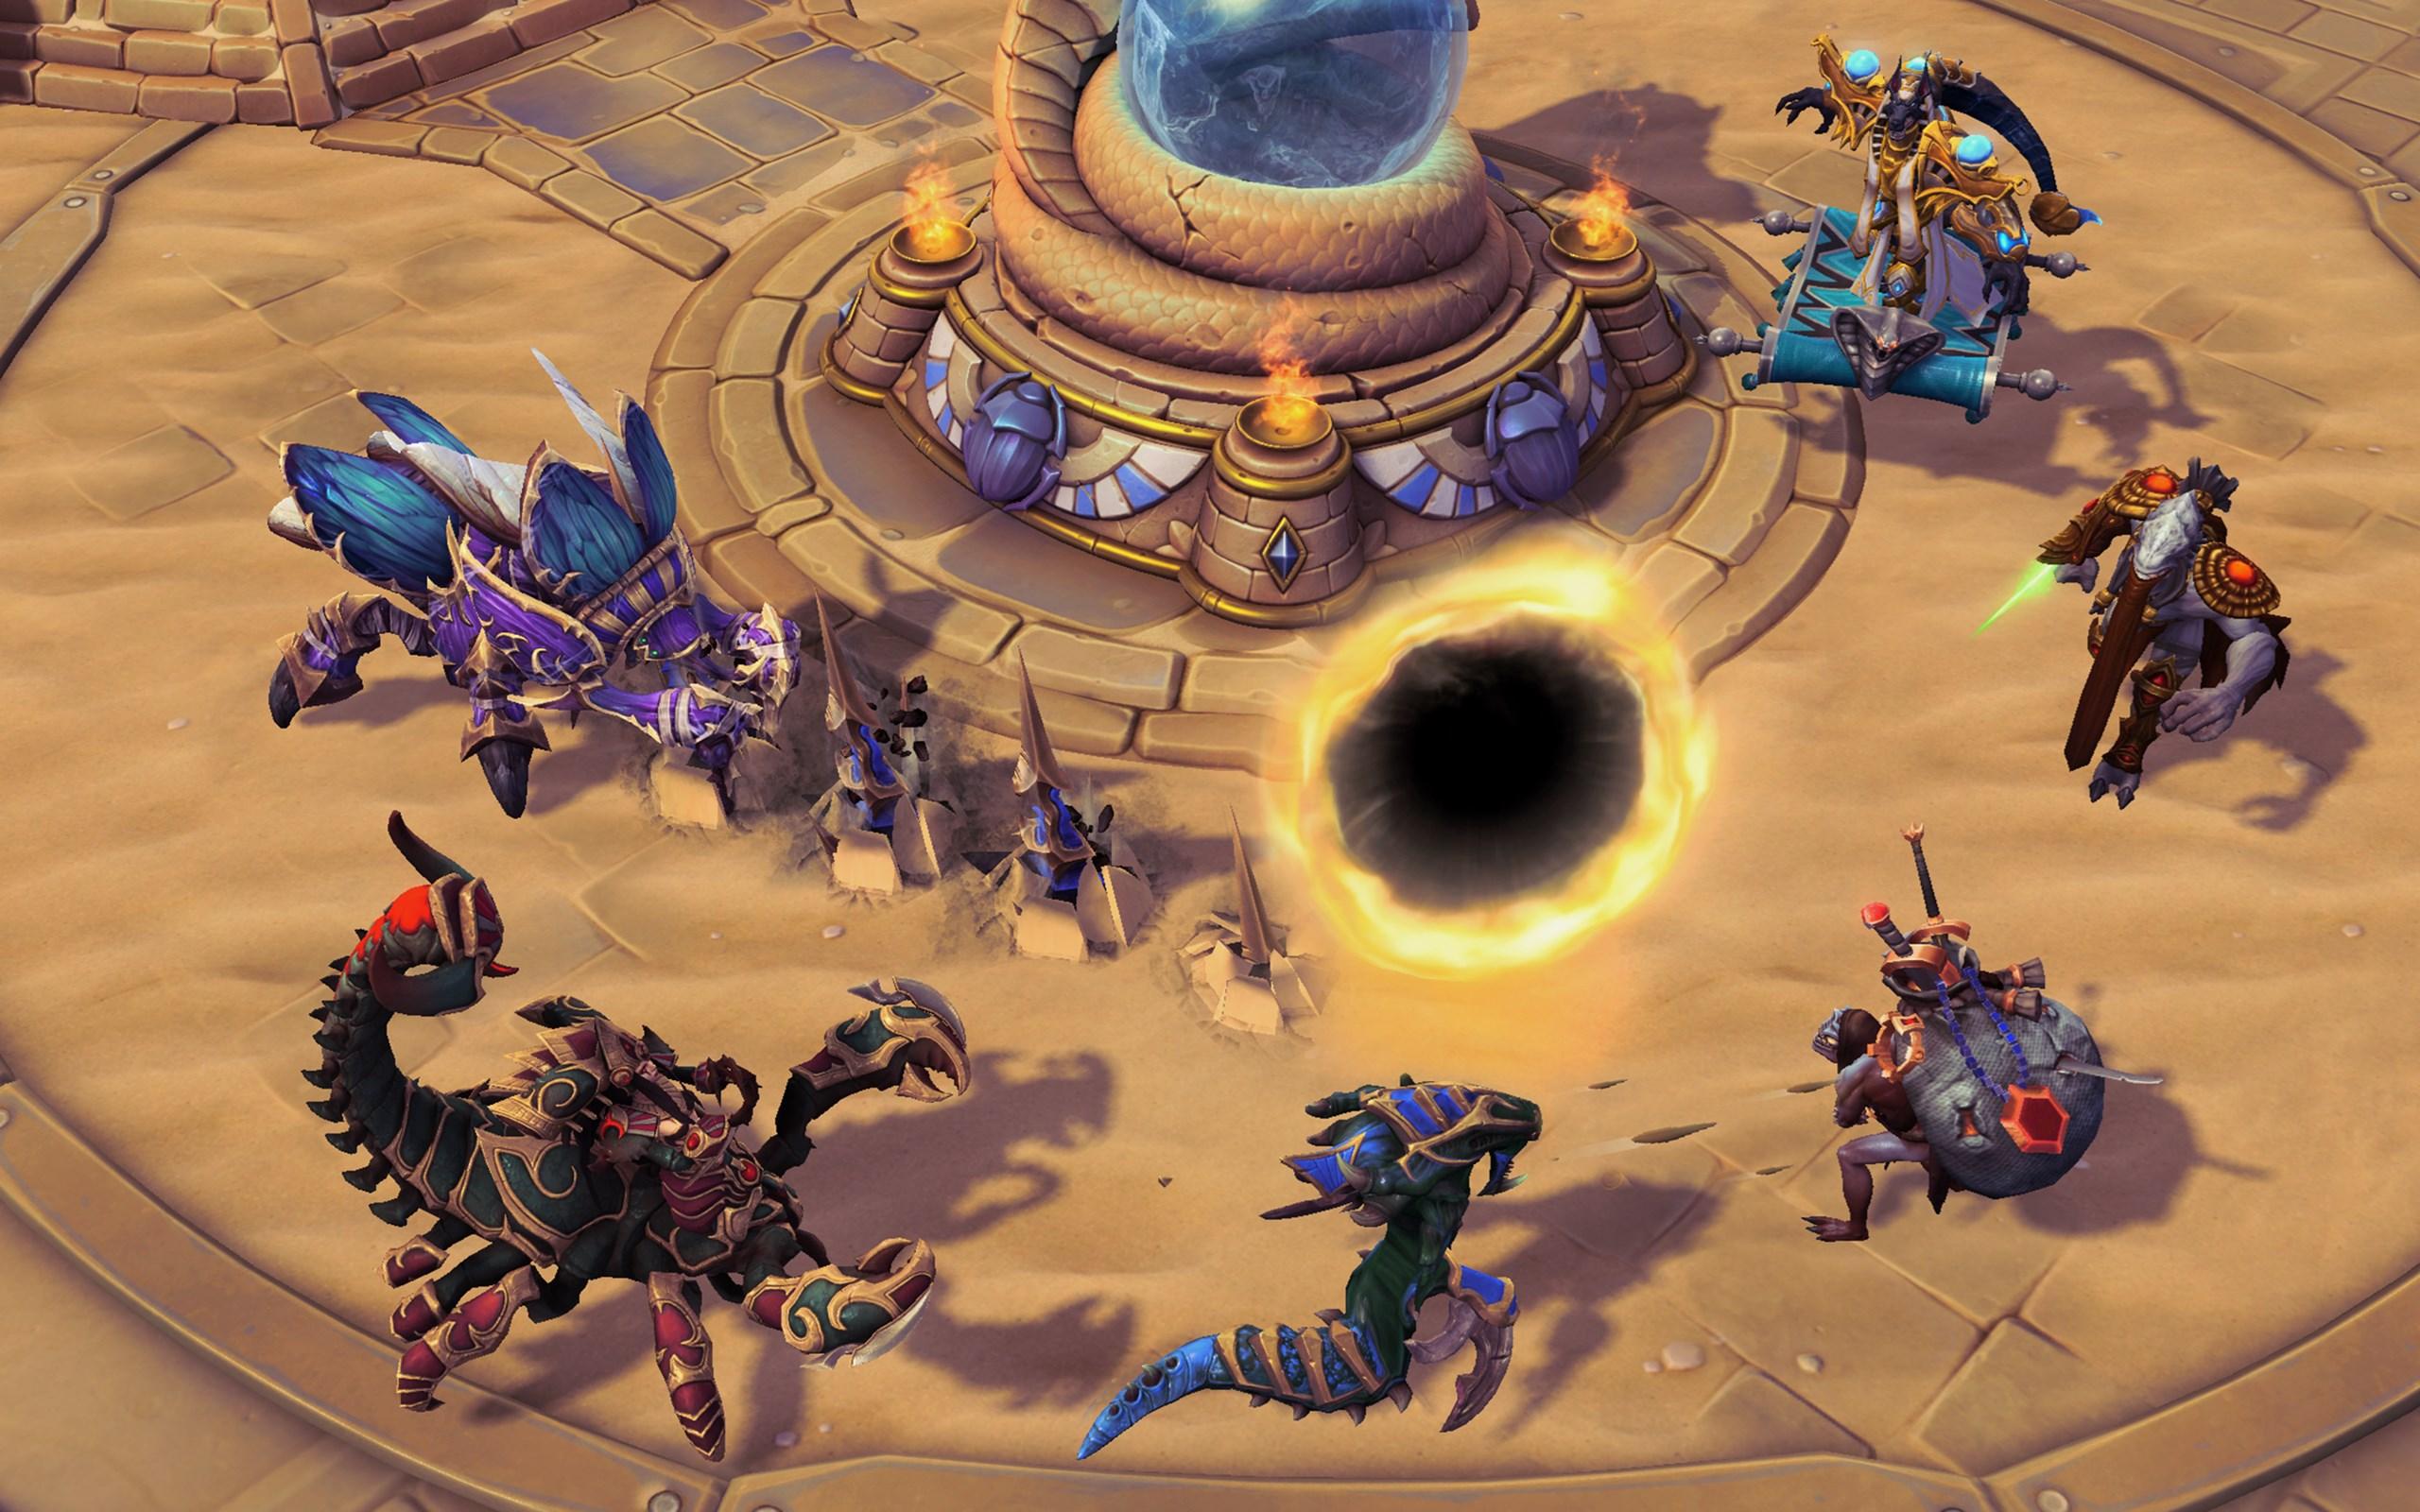 Everybody dance around the portal.